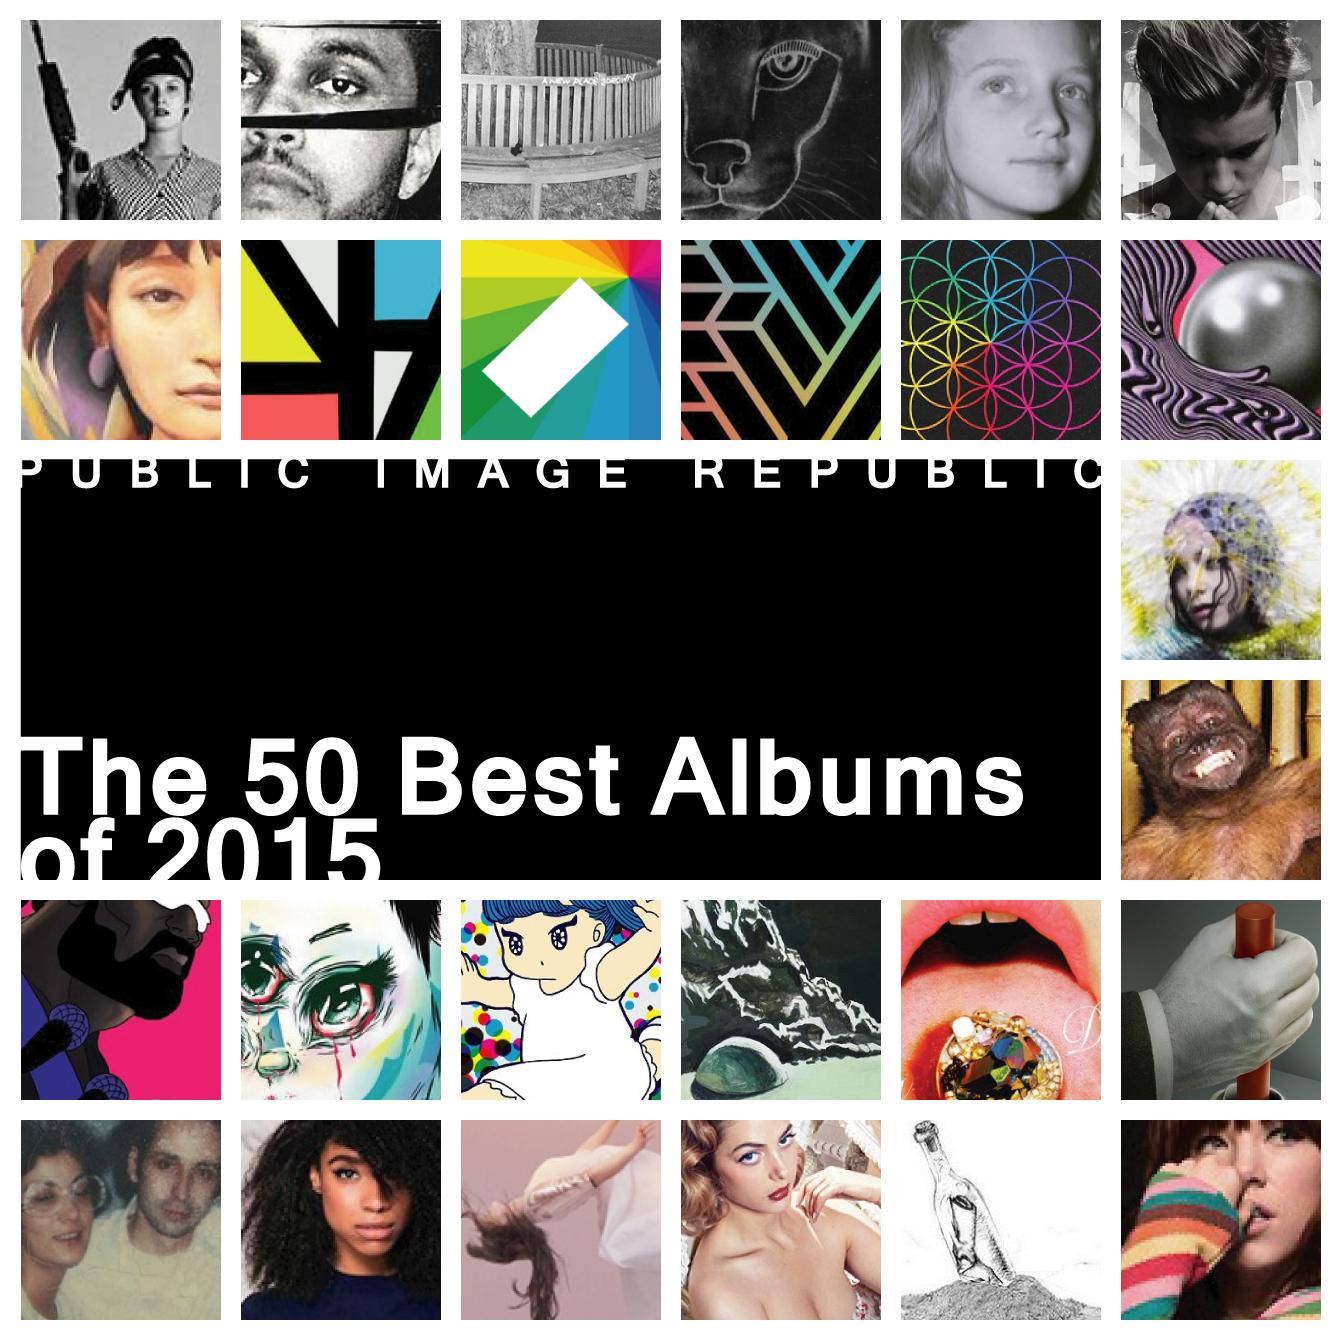 bestalbum2015_50.png